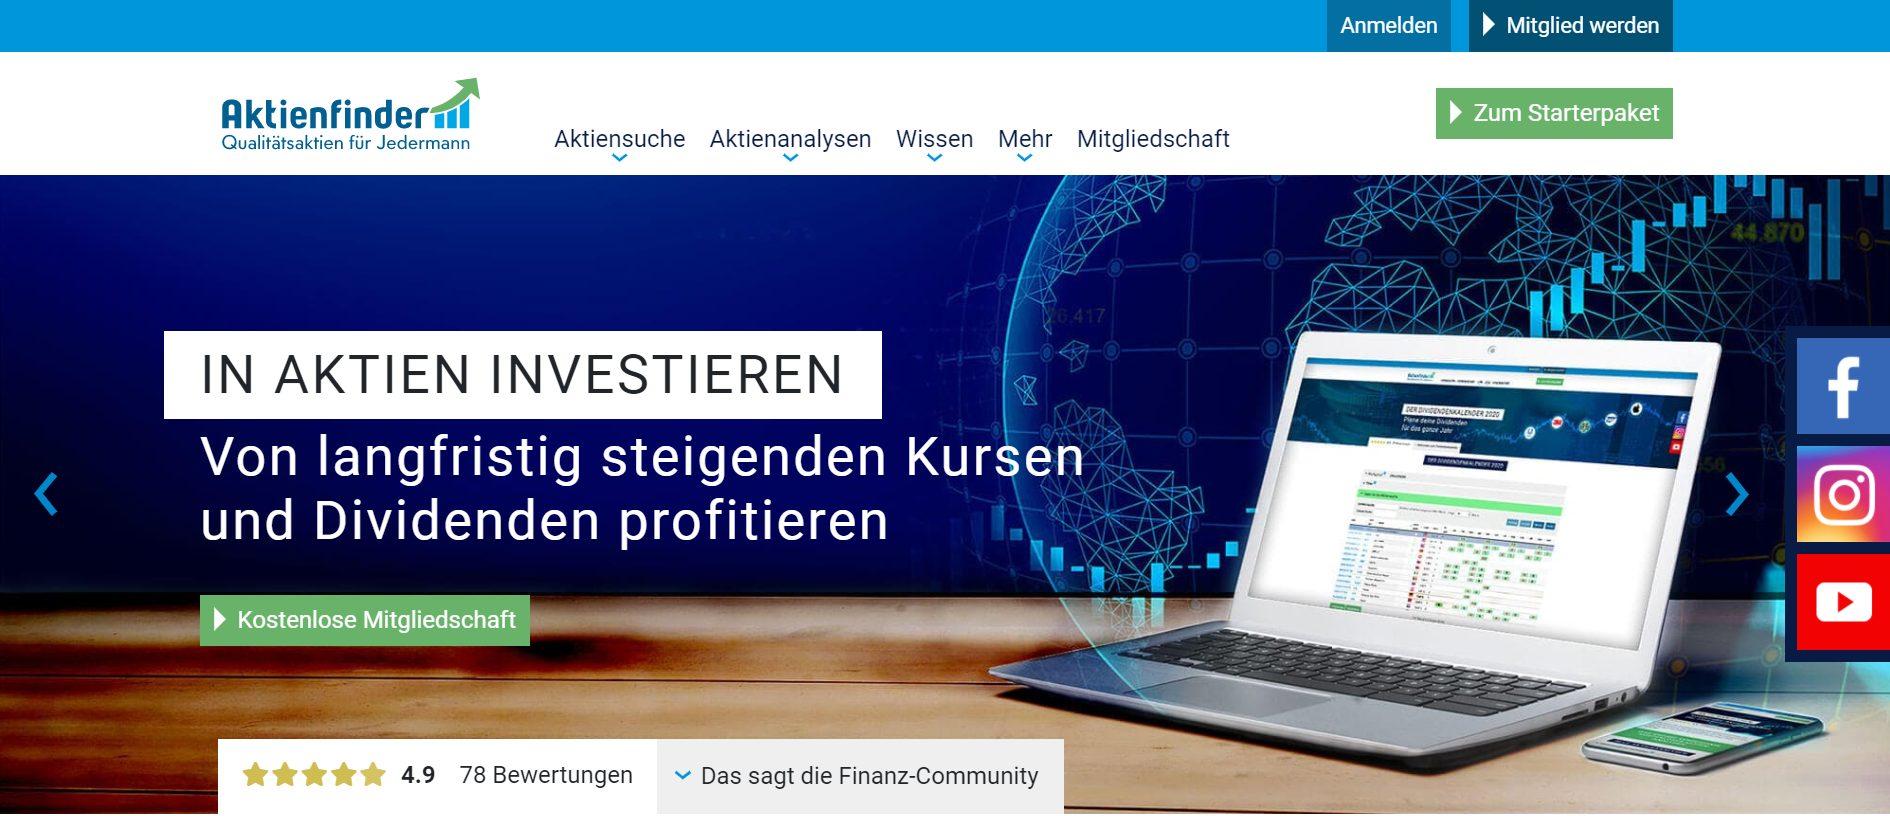 Aktienfinder.net Screenshot Website